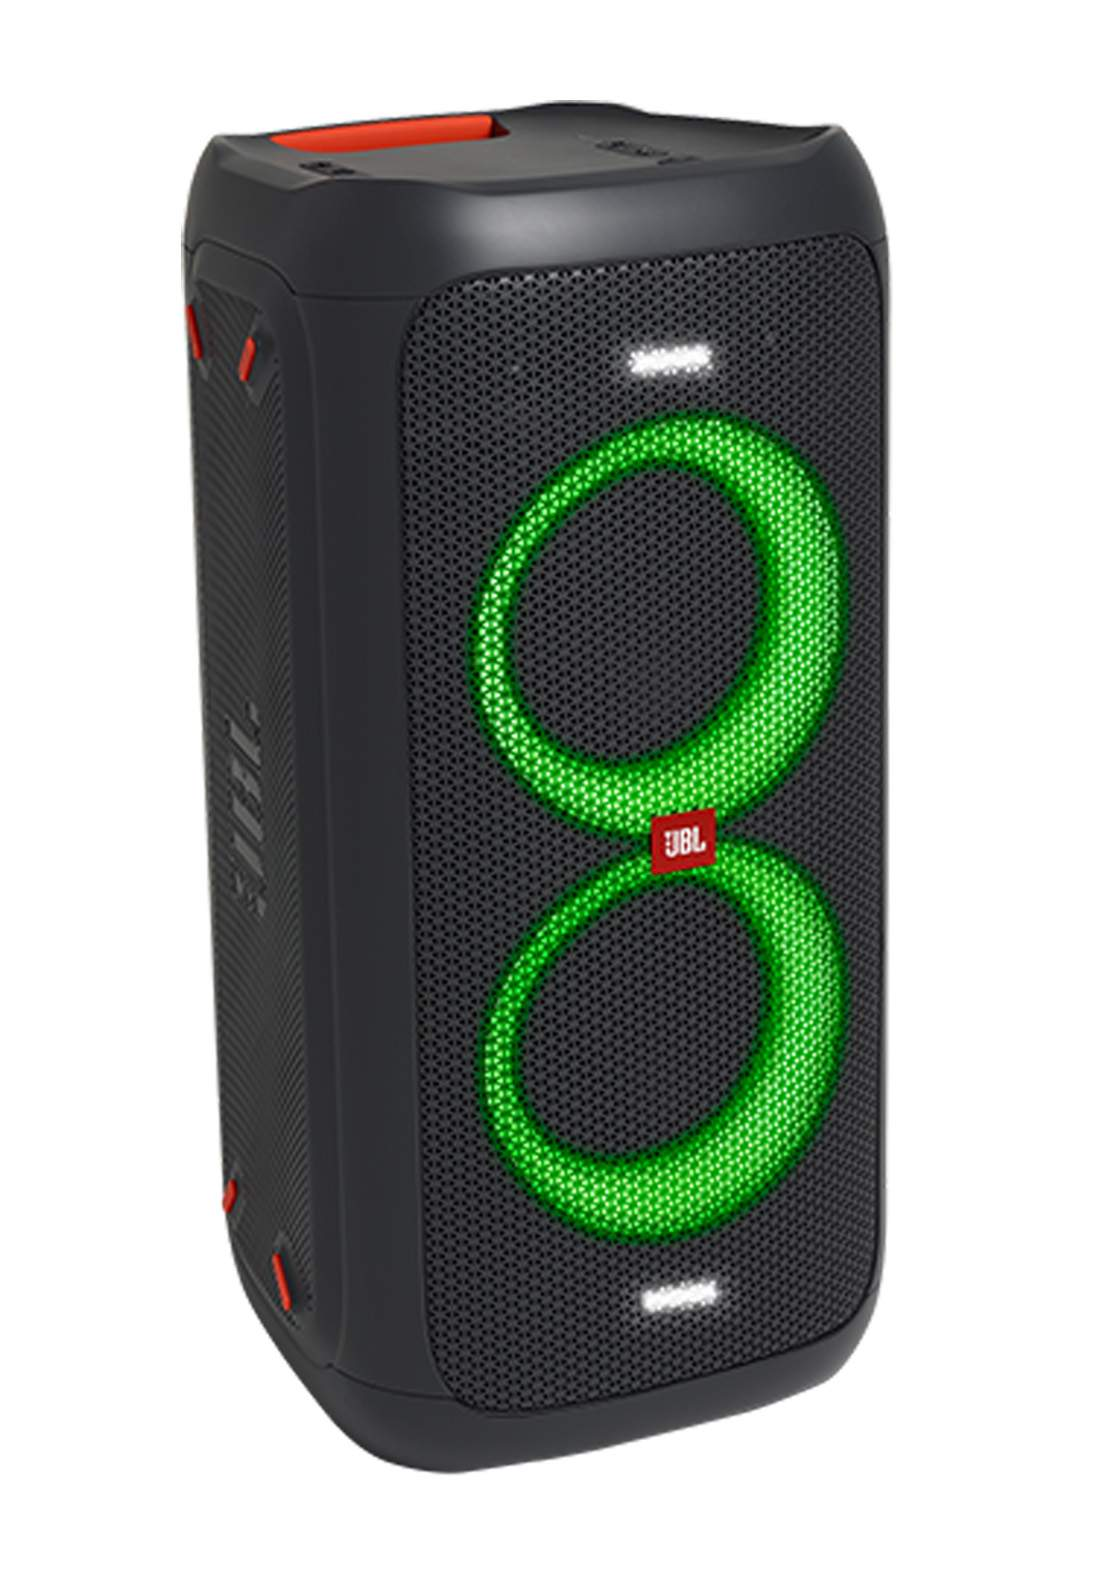 JBL PartyBox 100 Portable Wireless Speaker - Black مكبر صوت